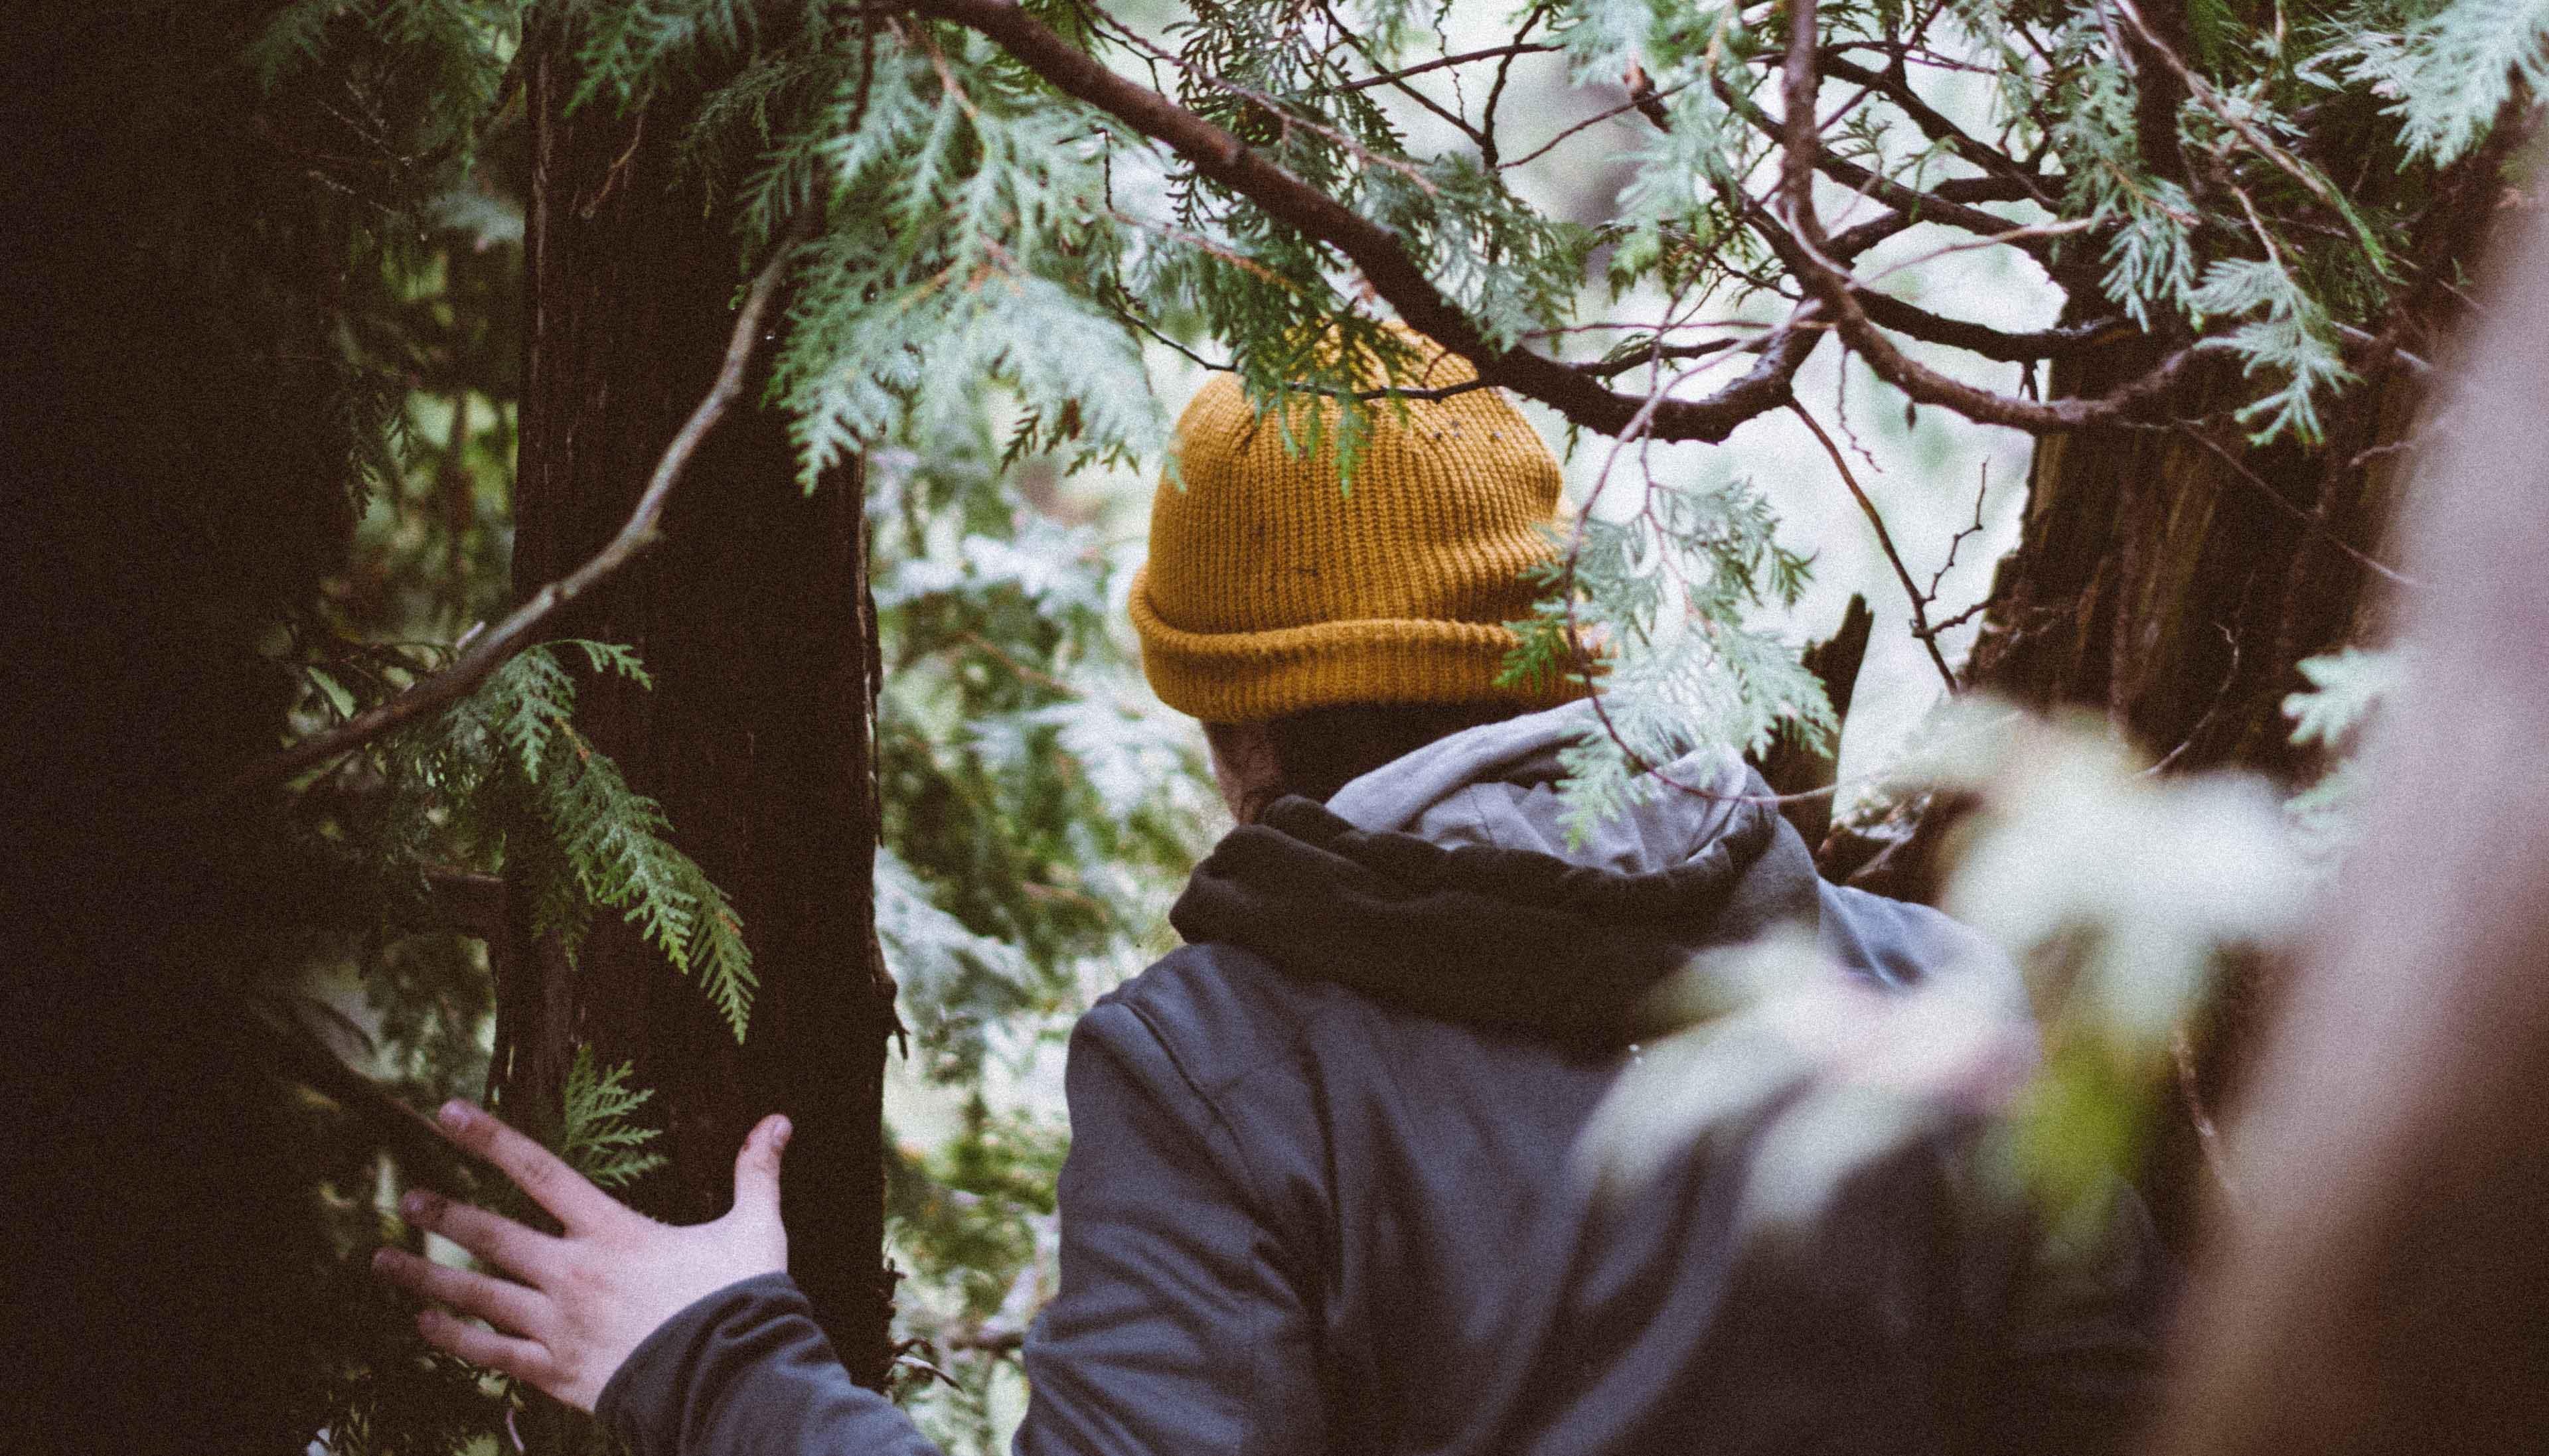 Aktivurlaub im Böhmerwald beim Wandern - Ramenai